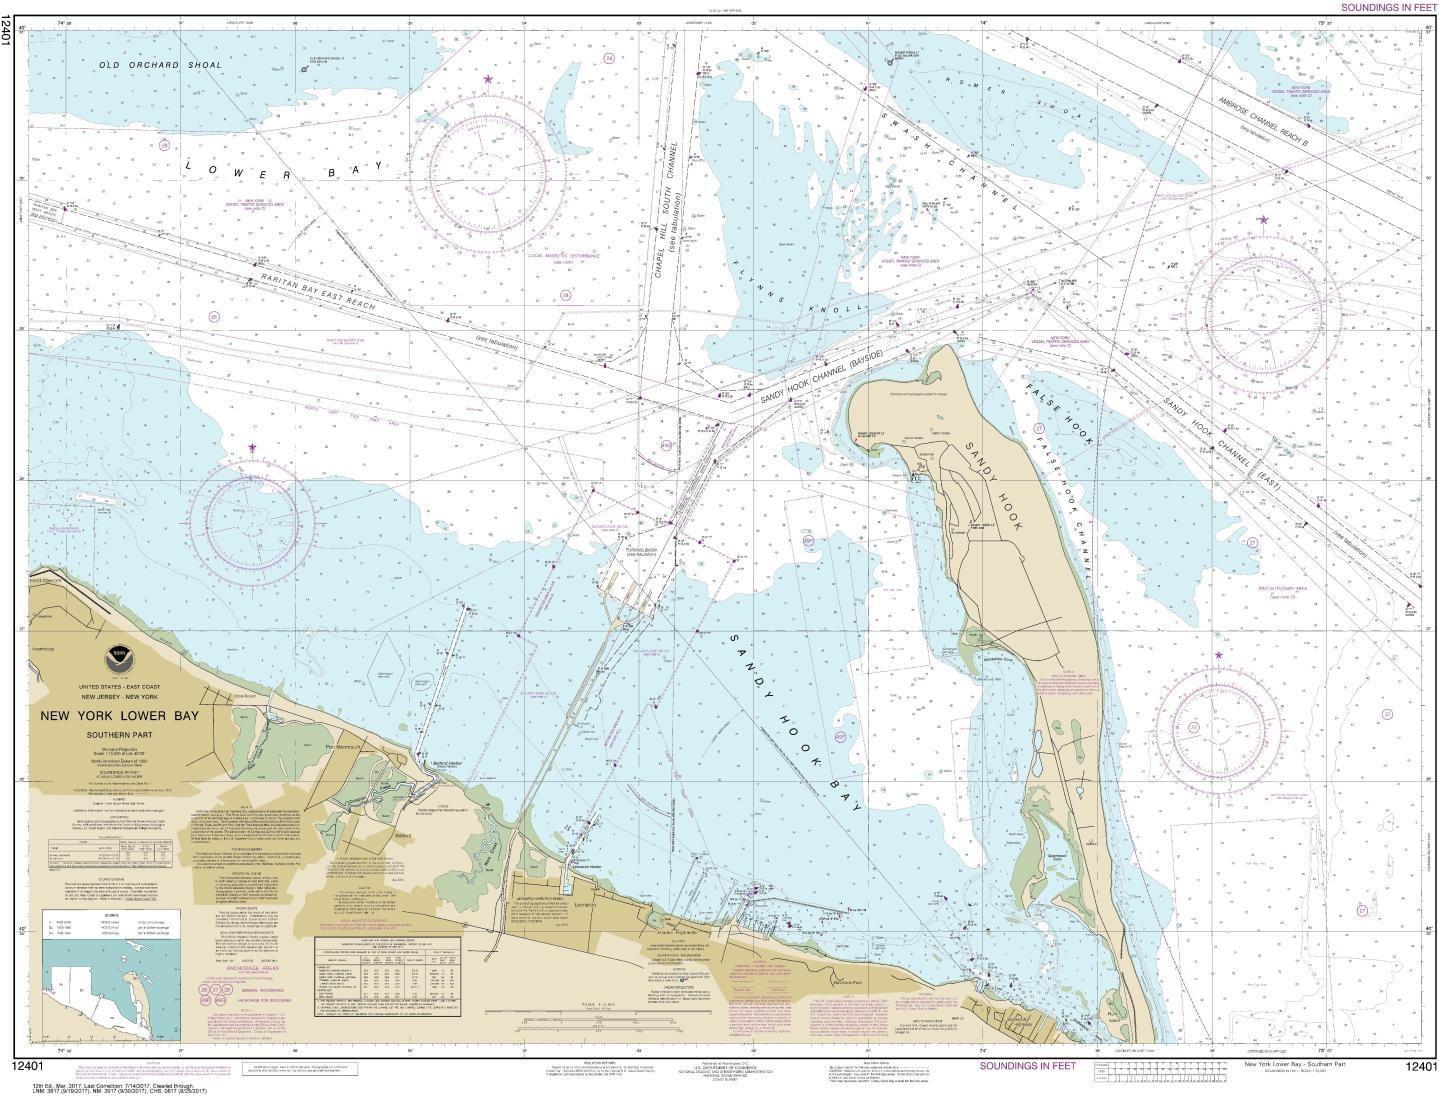 New York Lower Bay 12401 12 By Noaa Nautical Chart Wall Art Prints Prints